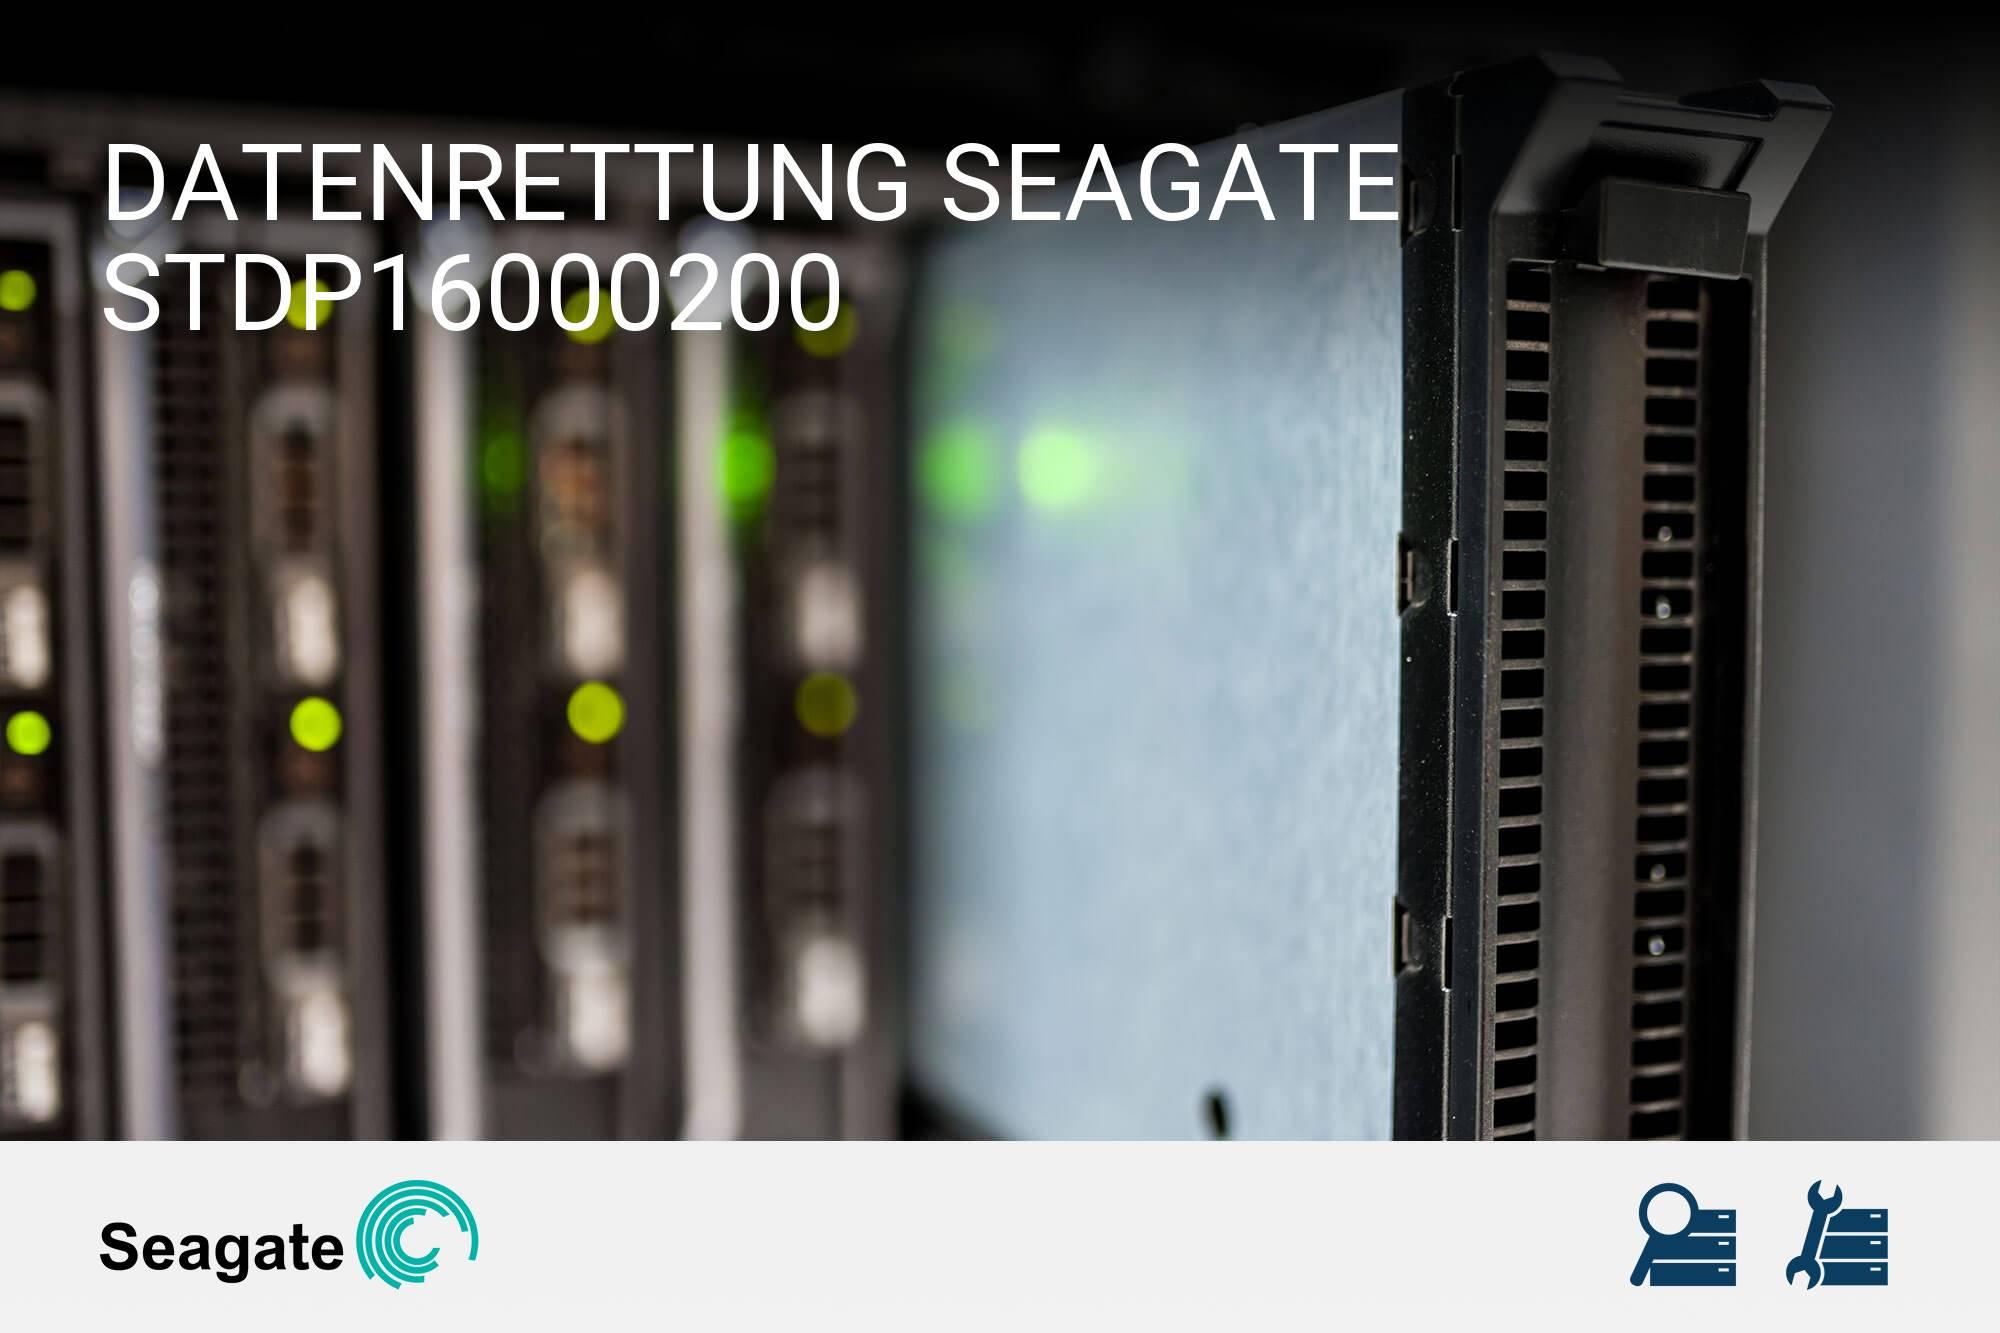 Seagate STDP16000200